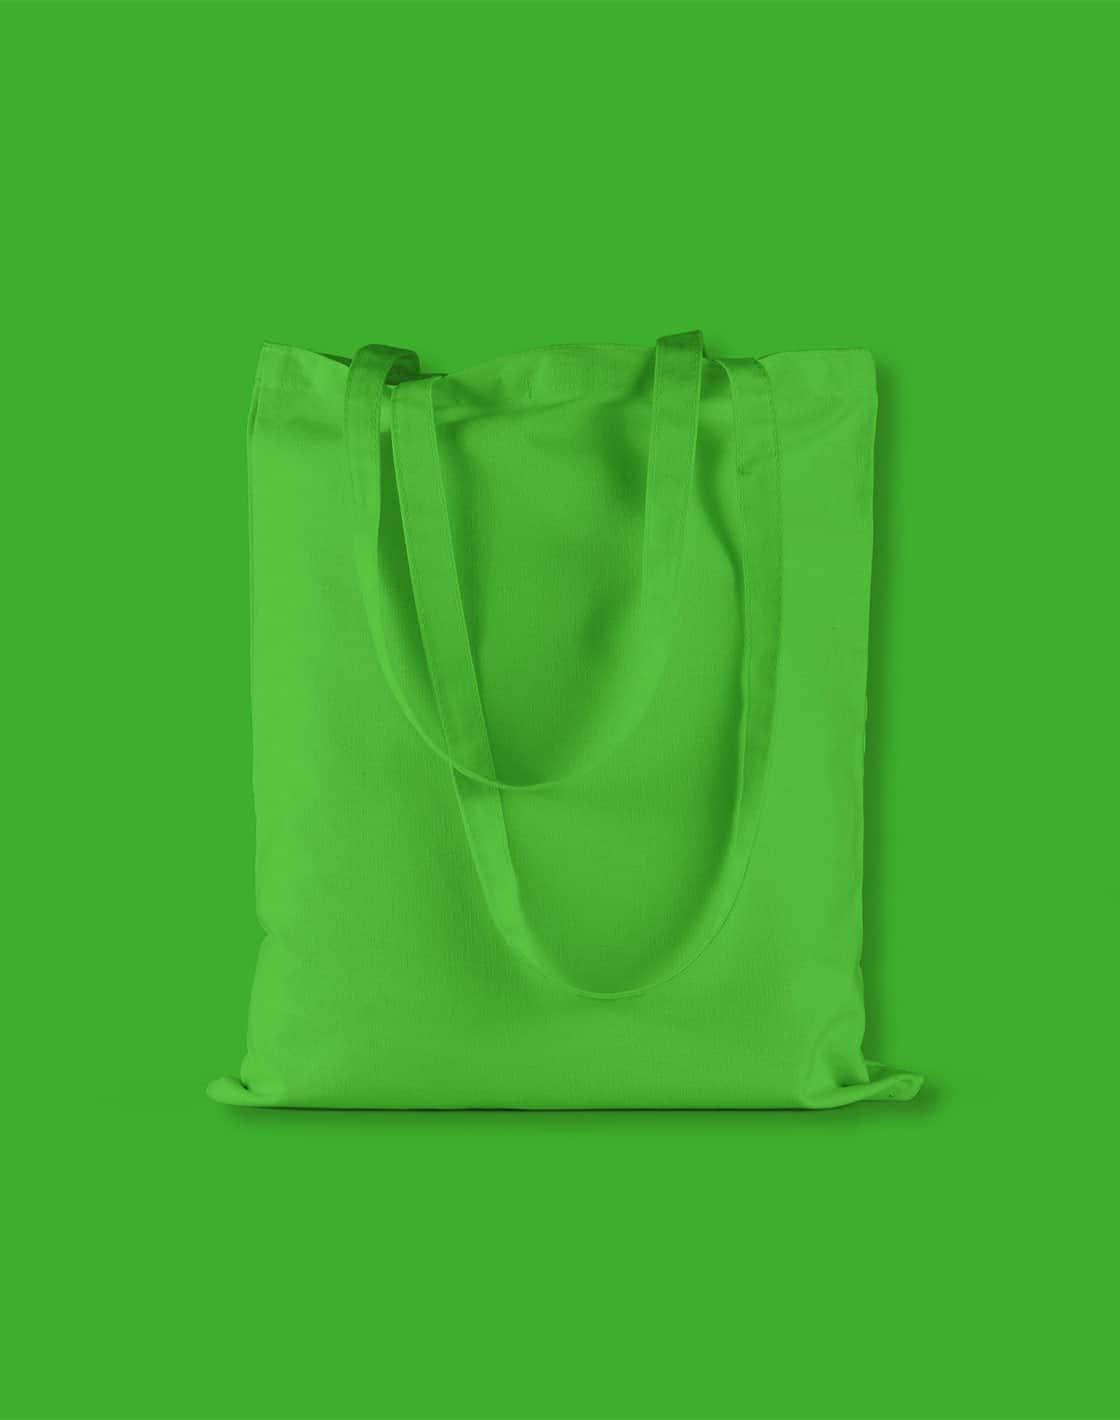 baumwolltaschen bunt apple green lange henkel 38x42cm